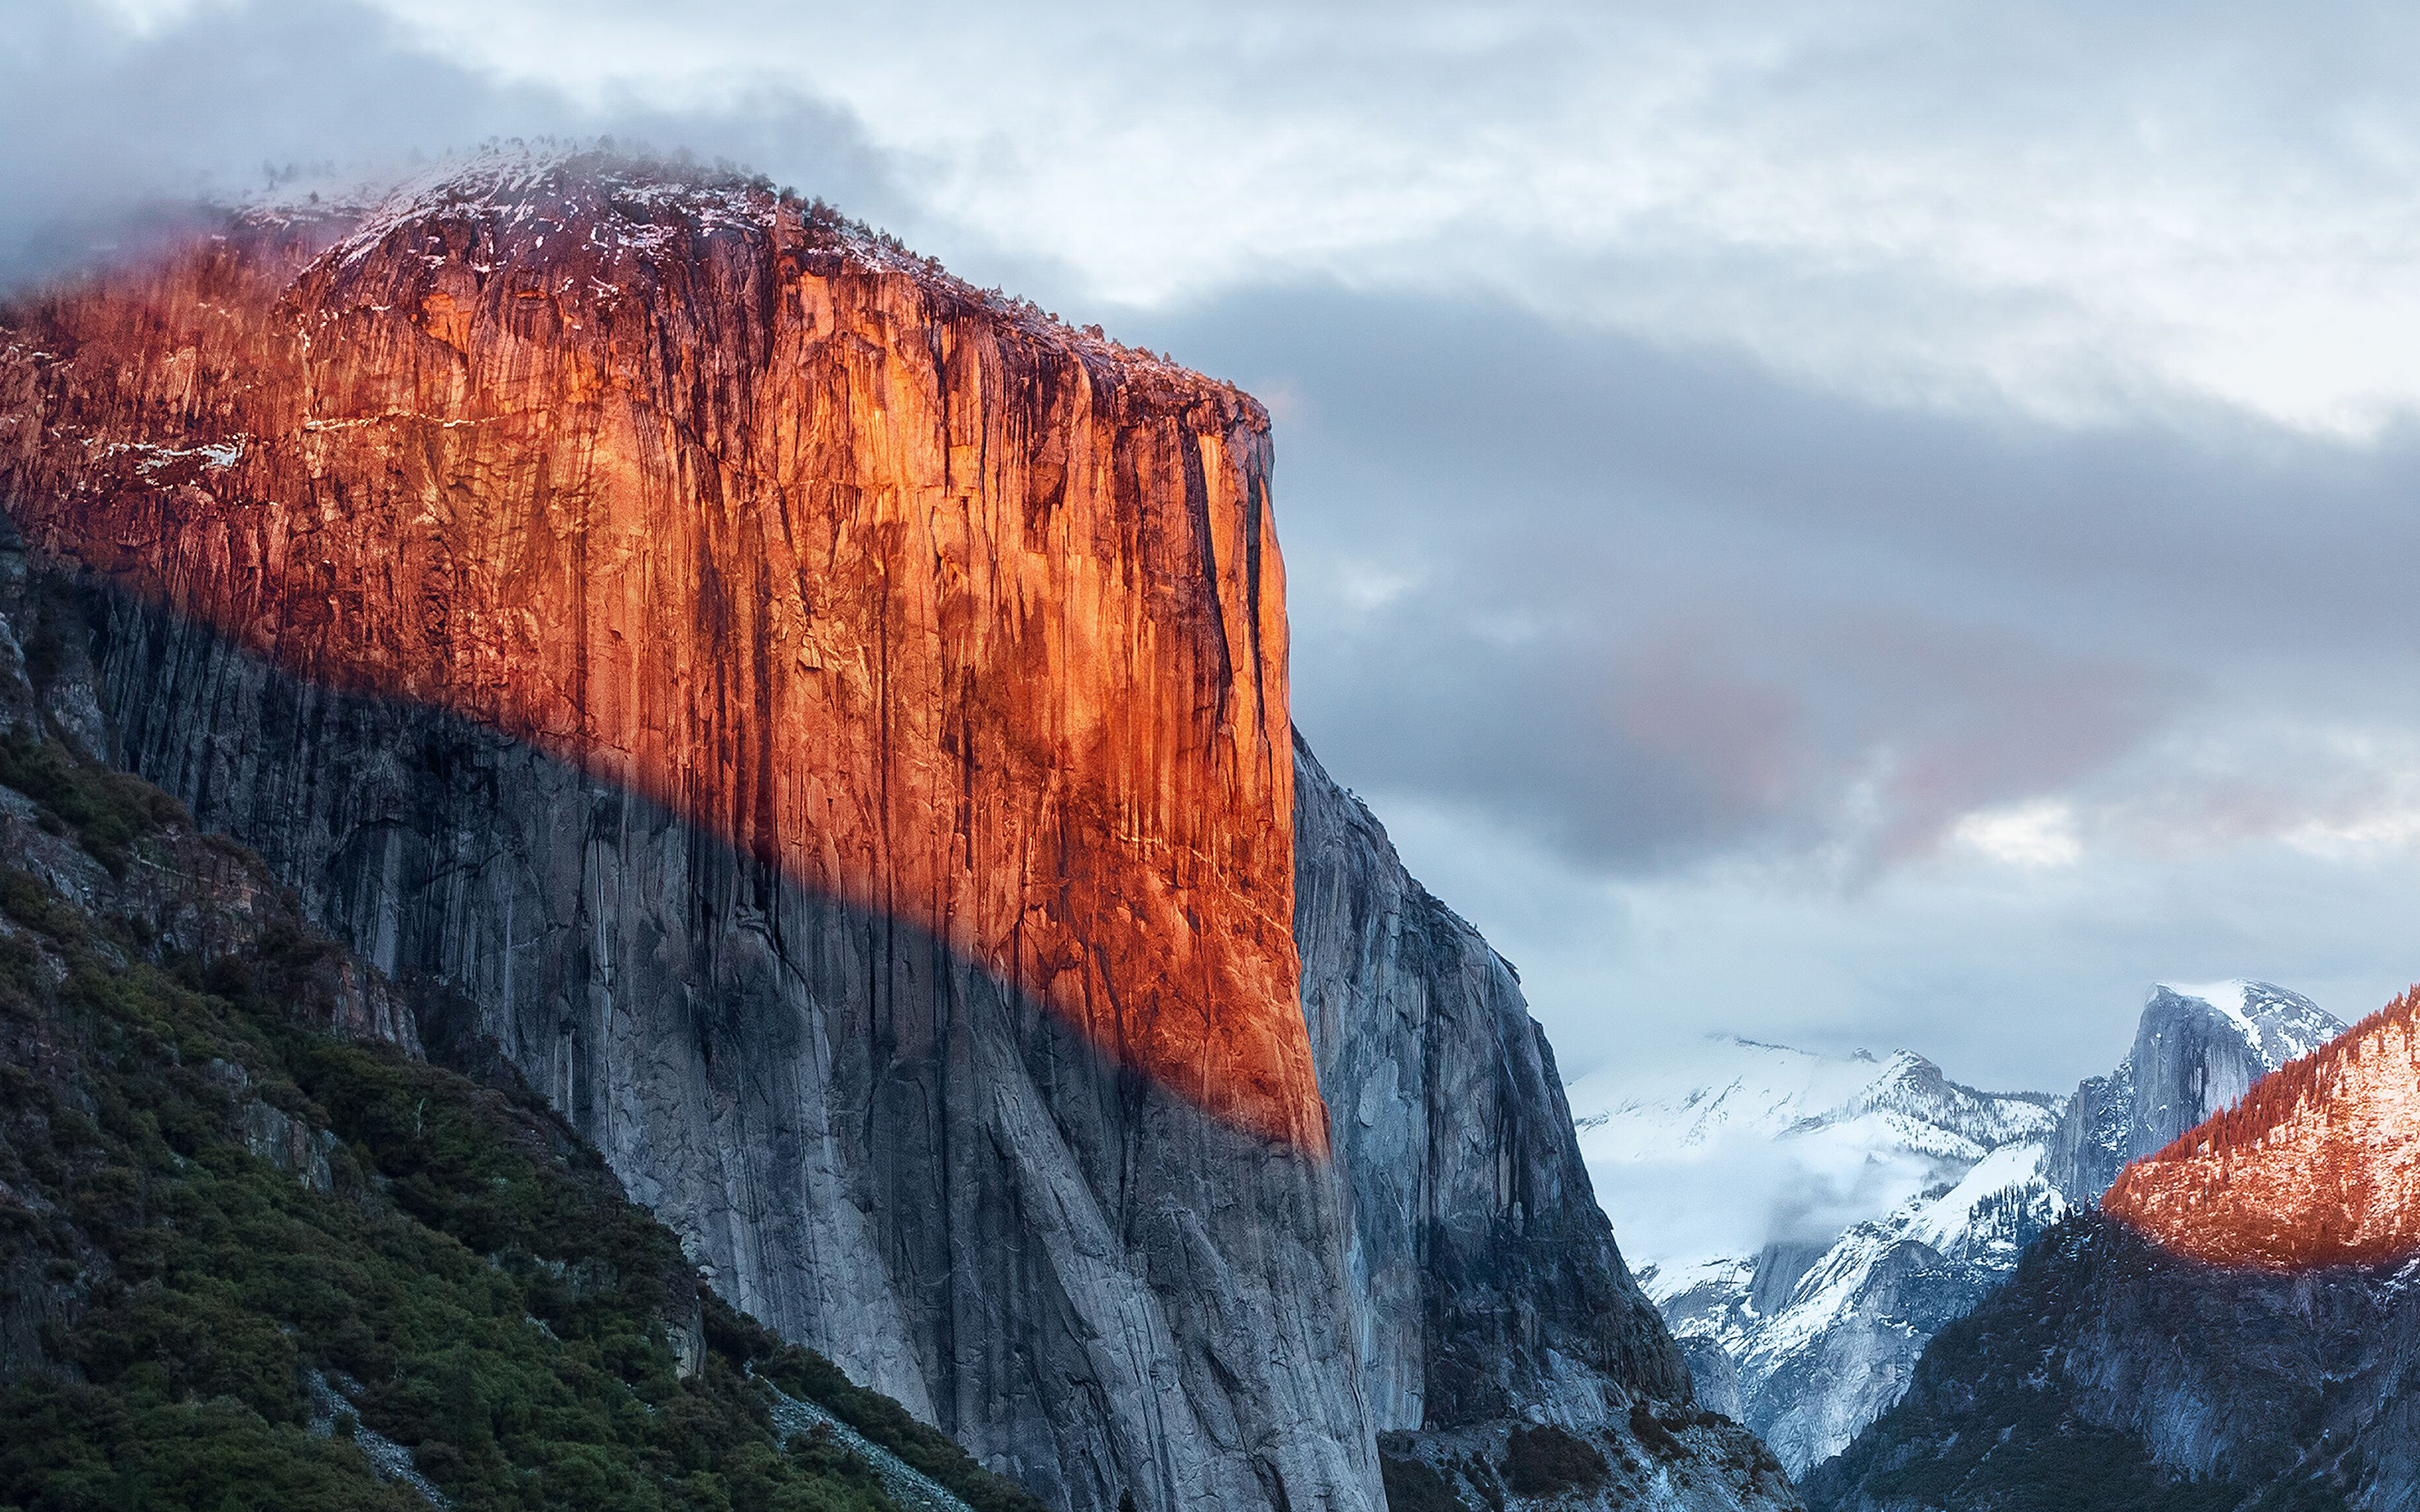 1440p Fall Wallpaper Am86 Apple El Capitan Osx Mac Mountain Wwdc Nature Papers Co